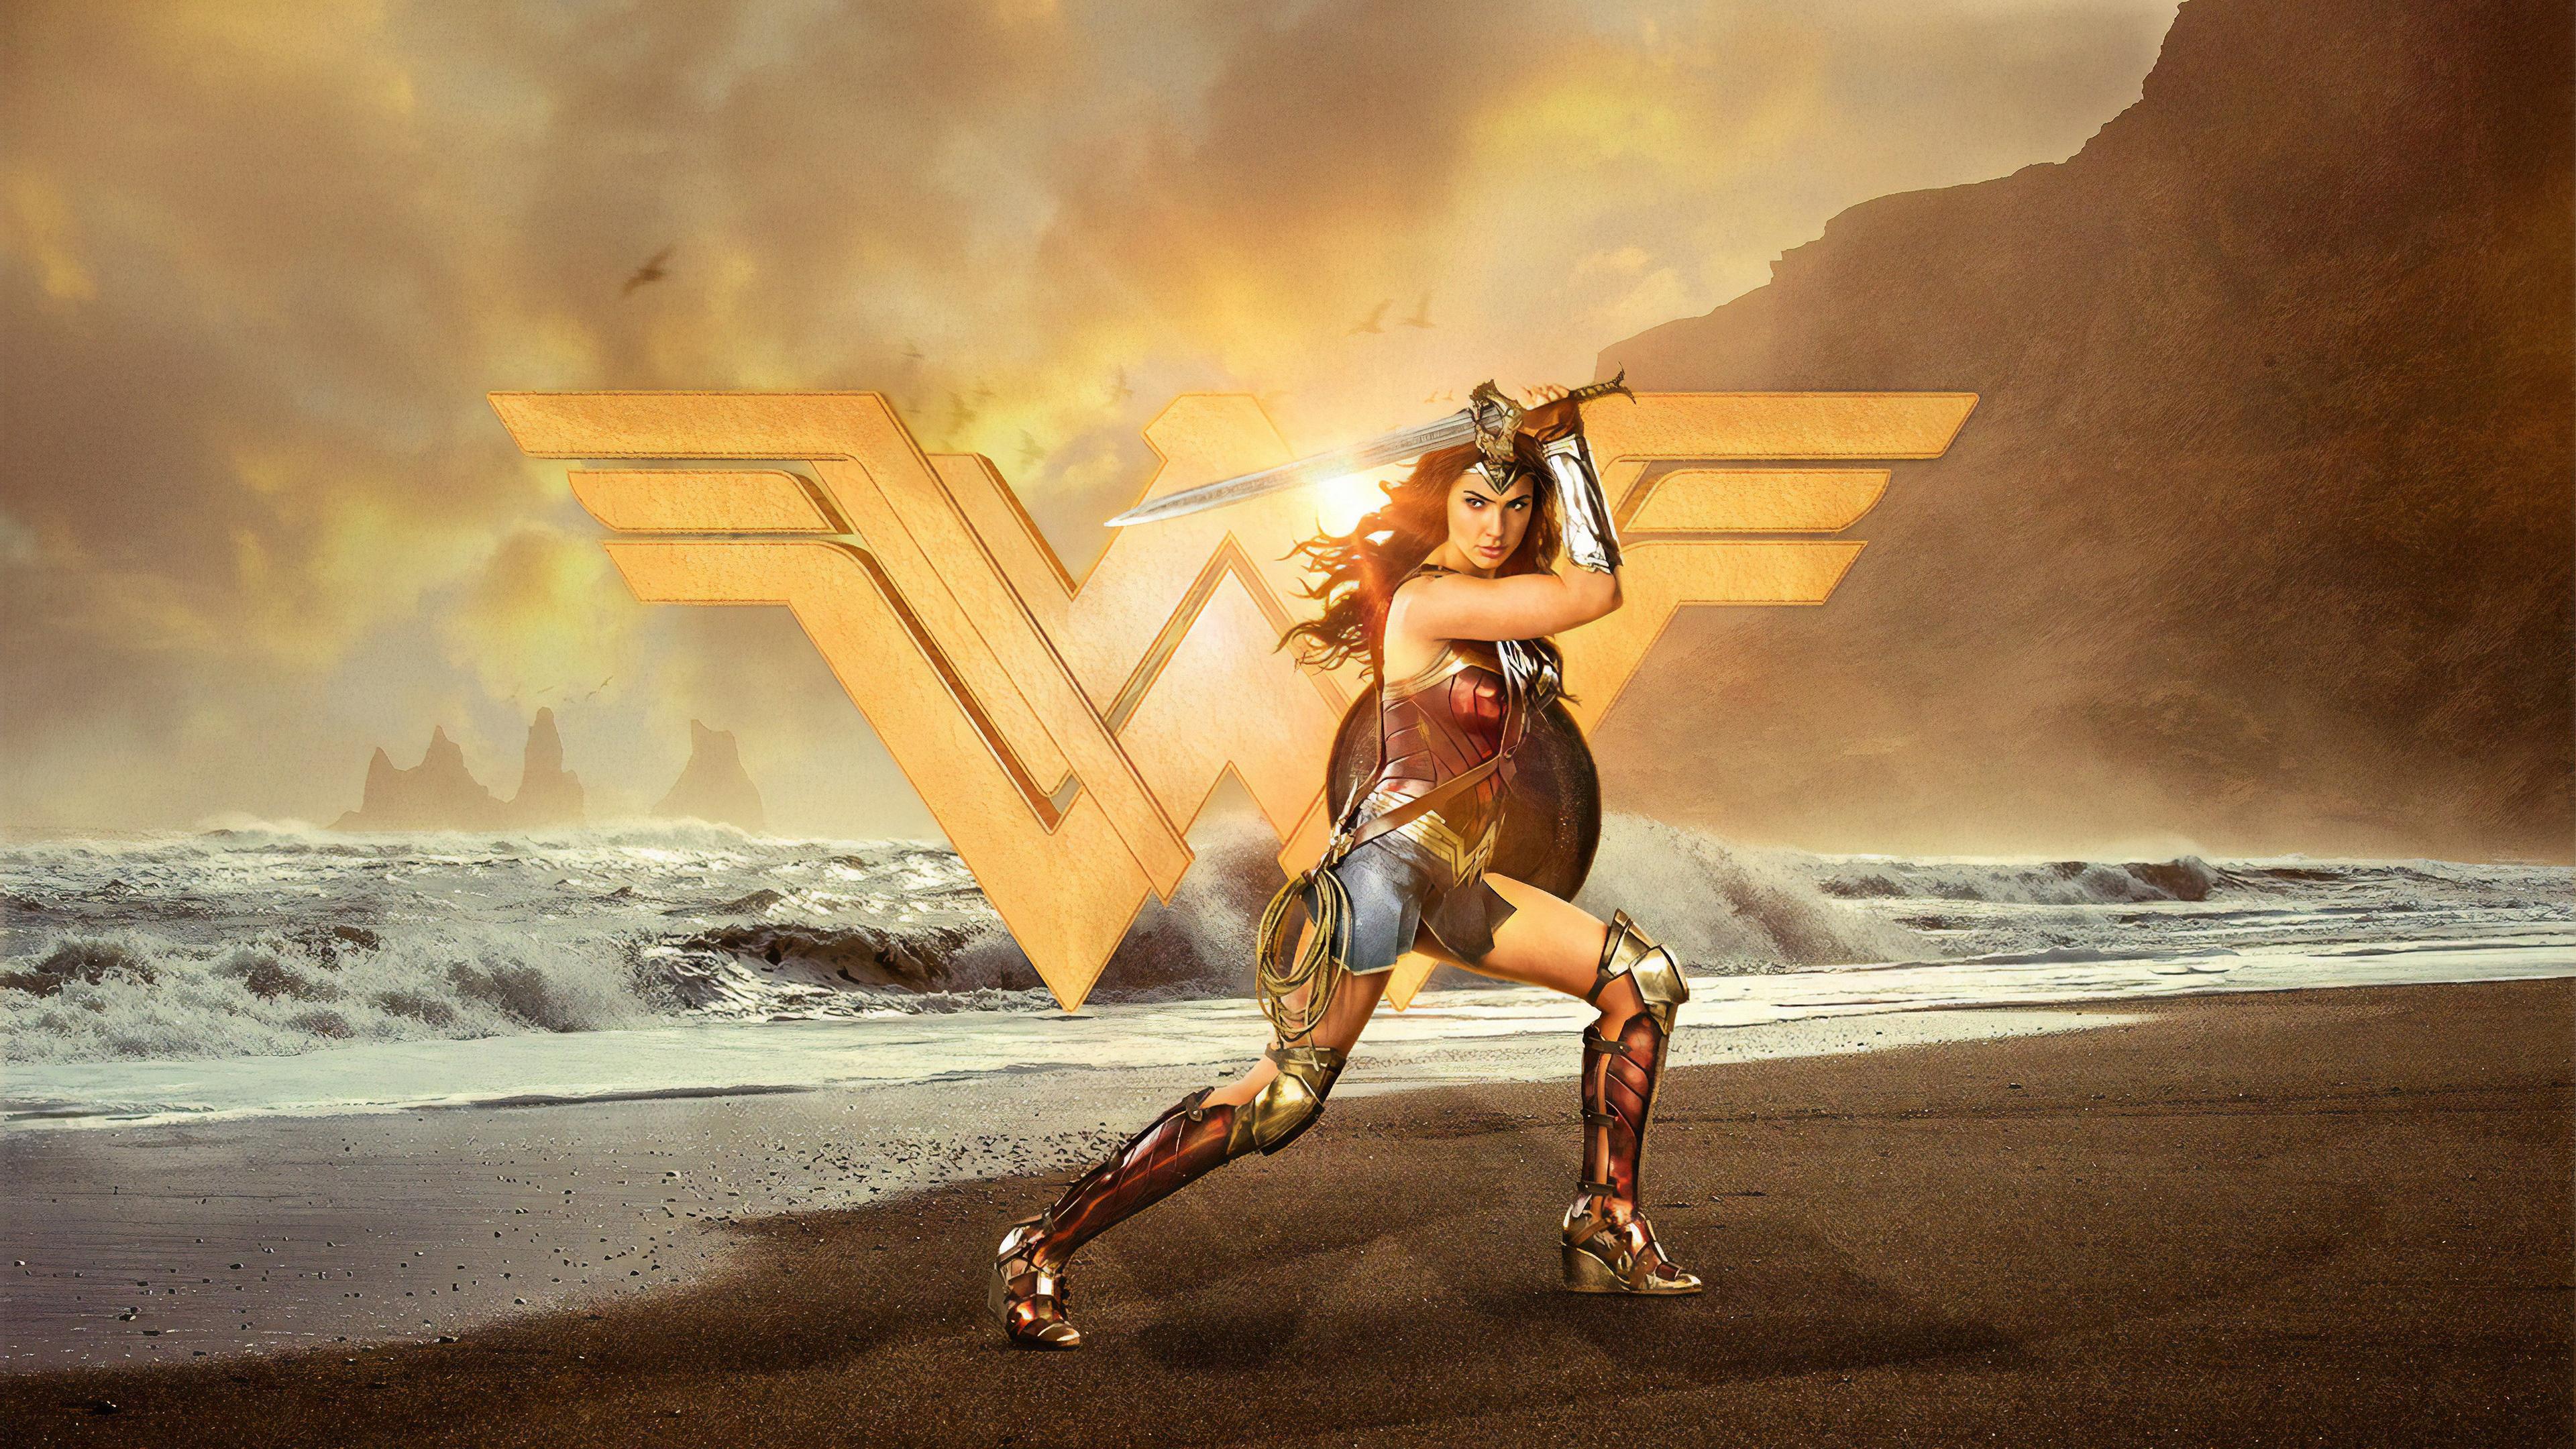 wonder woman gal gadot 1570394616 - Wonder Woman Gal Gadot - wonder woman wallpapers, superheroes wallpapers, hd-wallpapers, digital art wallpapers, artwork wallpapers, 4k-wallpapers